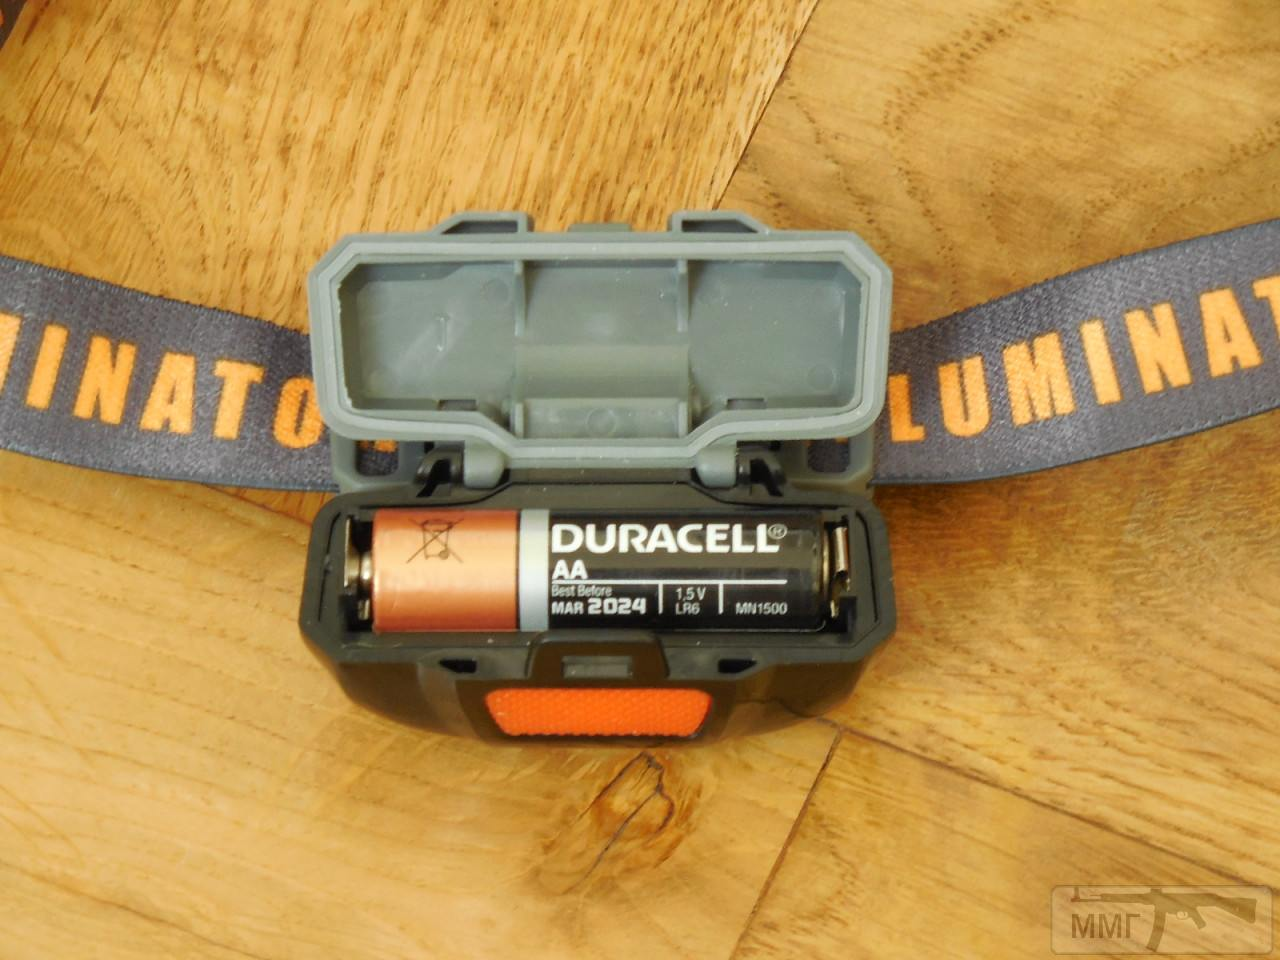 87302 - Налобный фонарь Sunree Ree koпiя на батарейку АА 1,5в. аккум 14500 Li-on